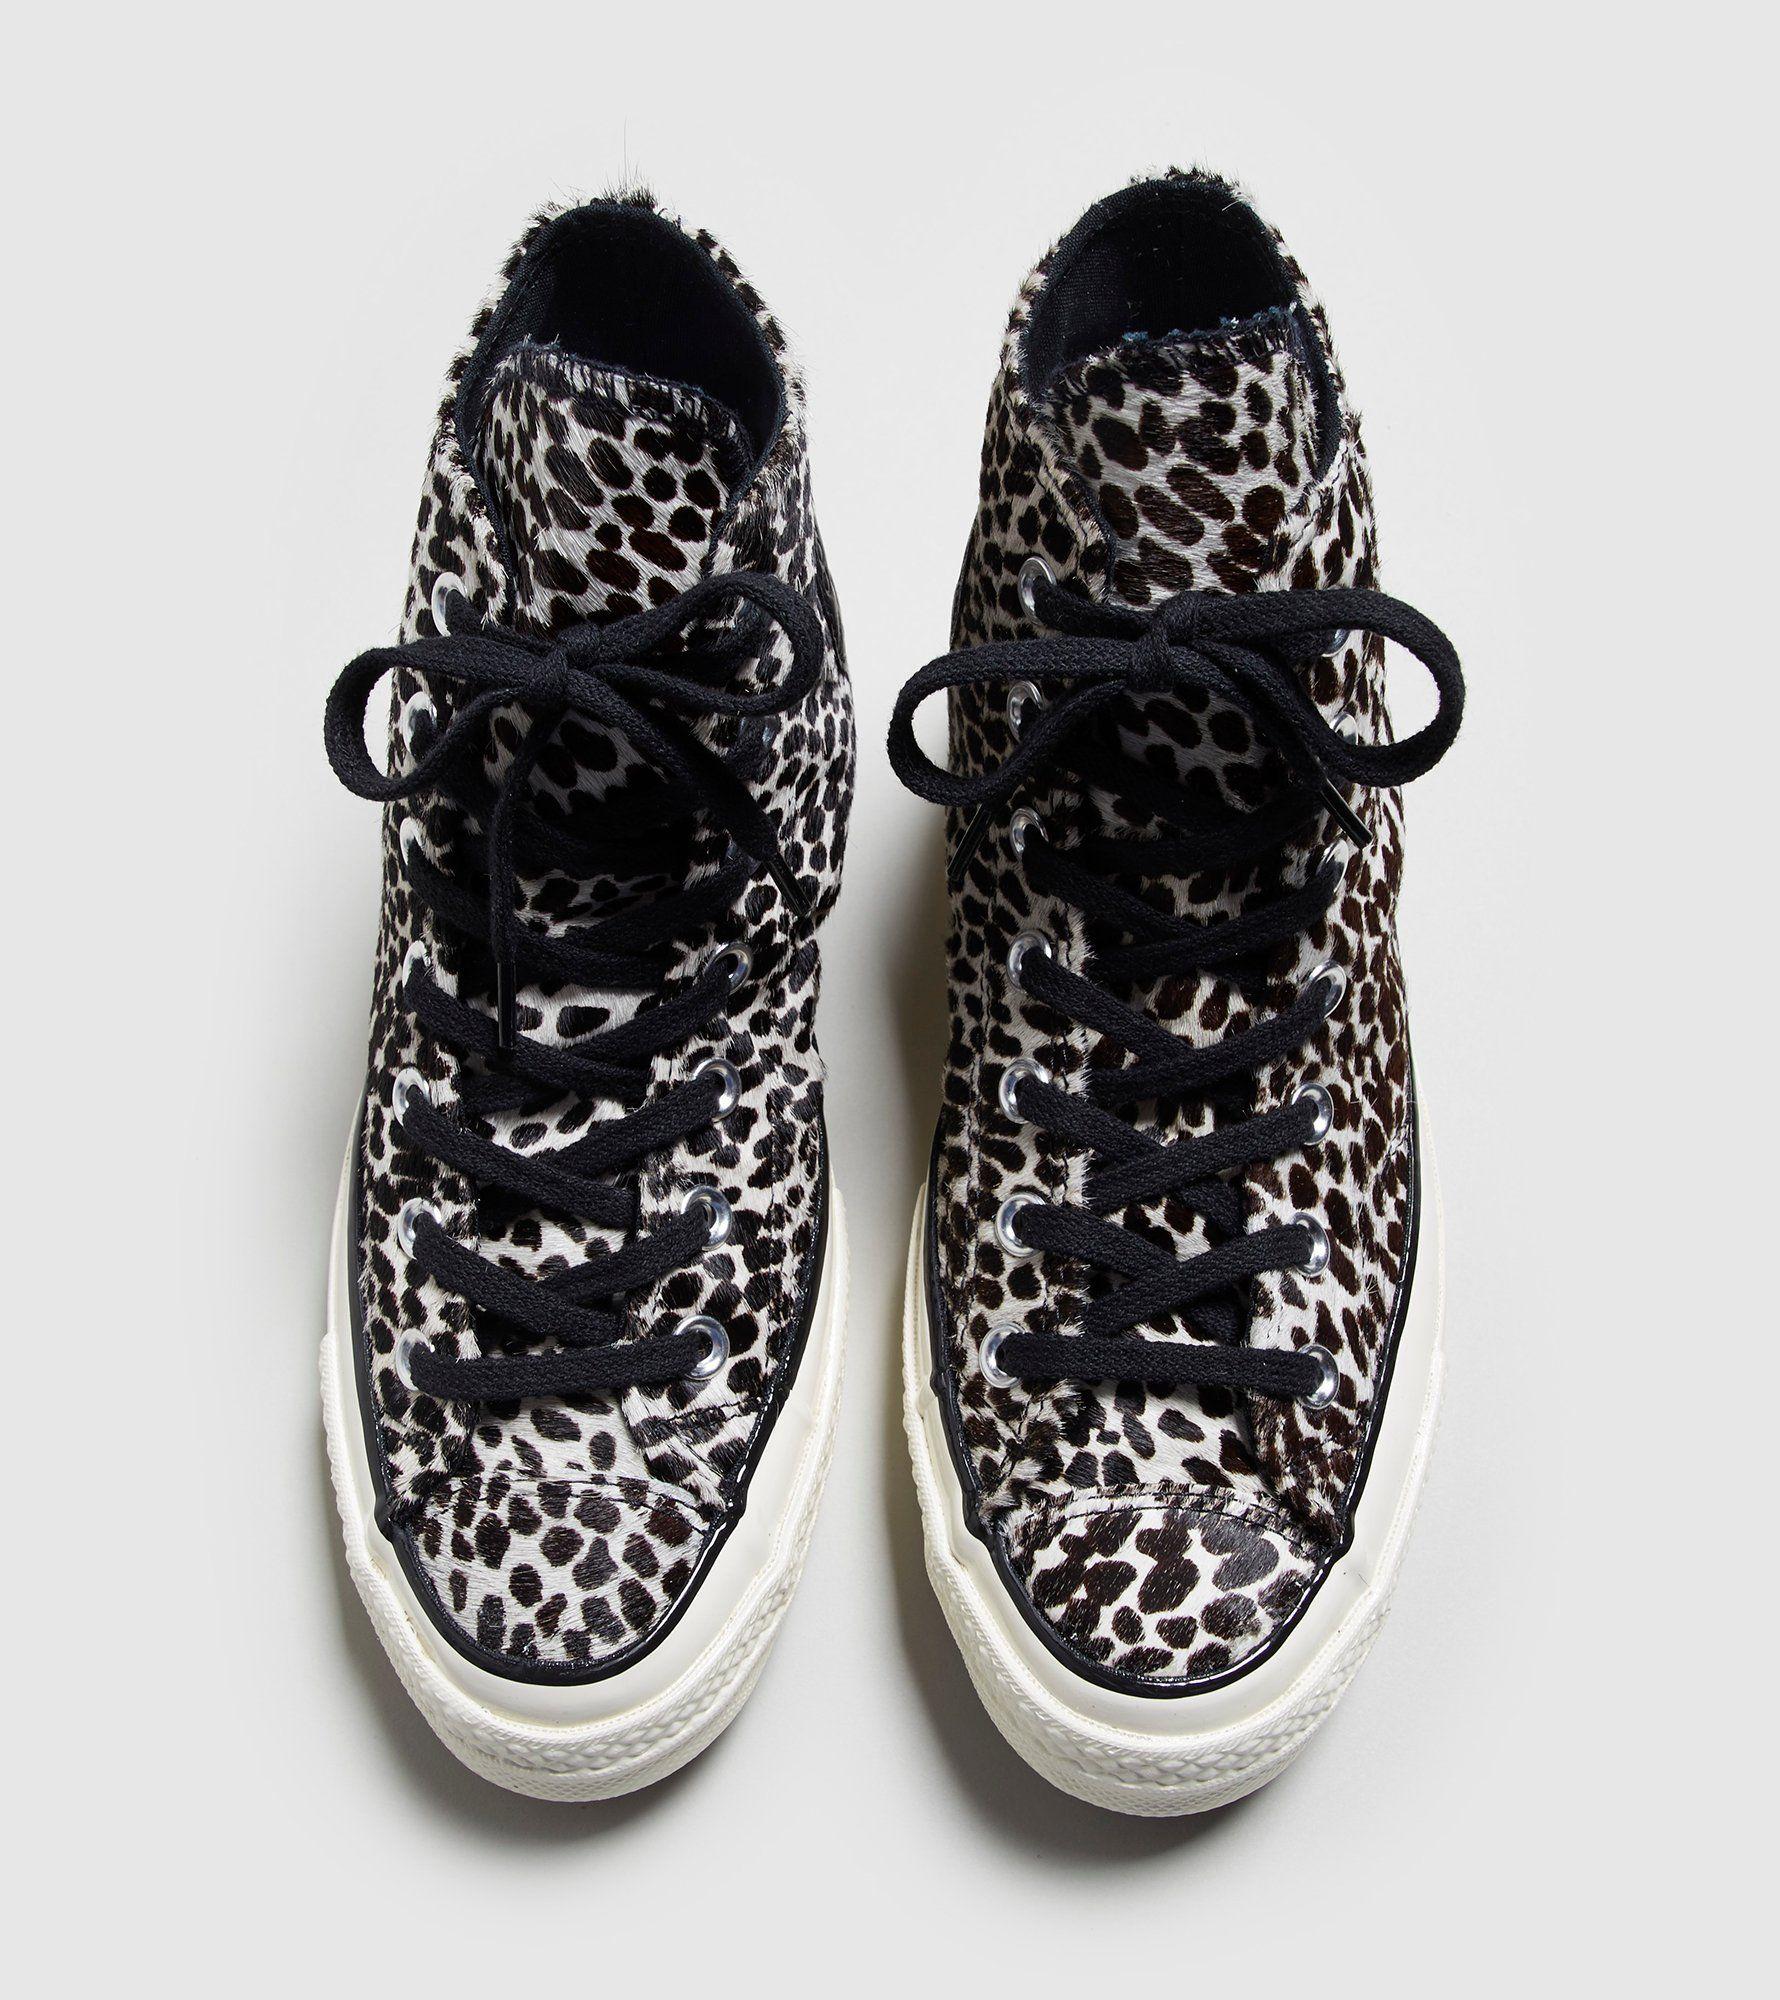 Converse 70's Cheetah HI Women's